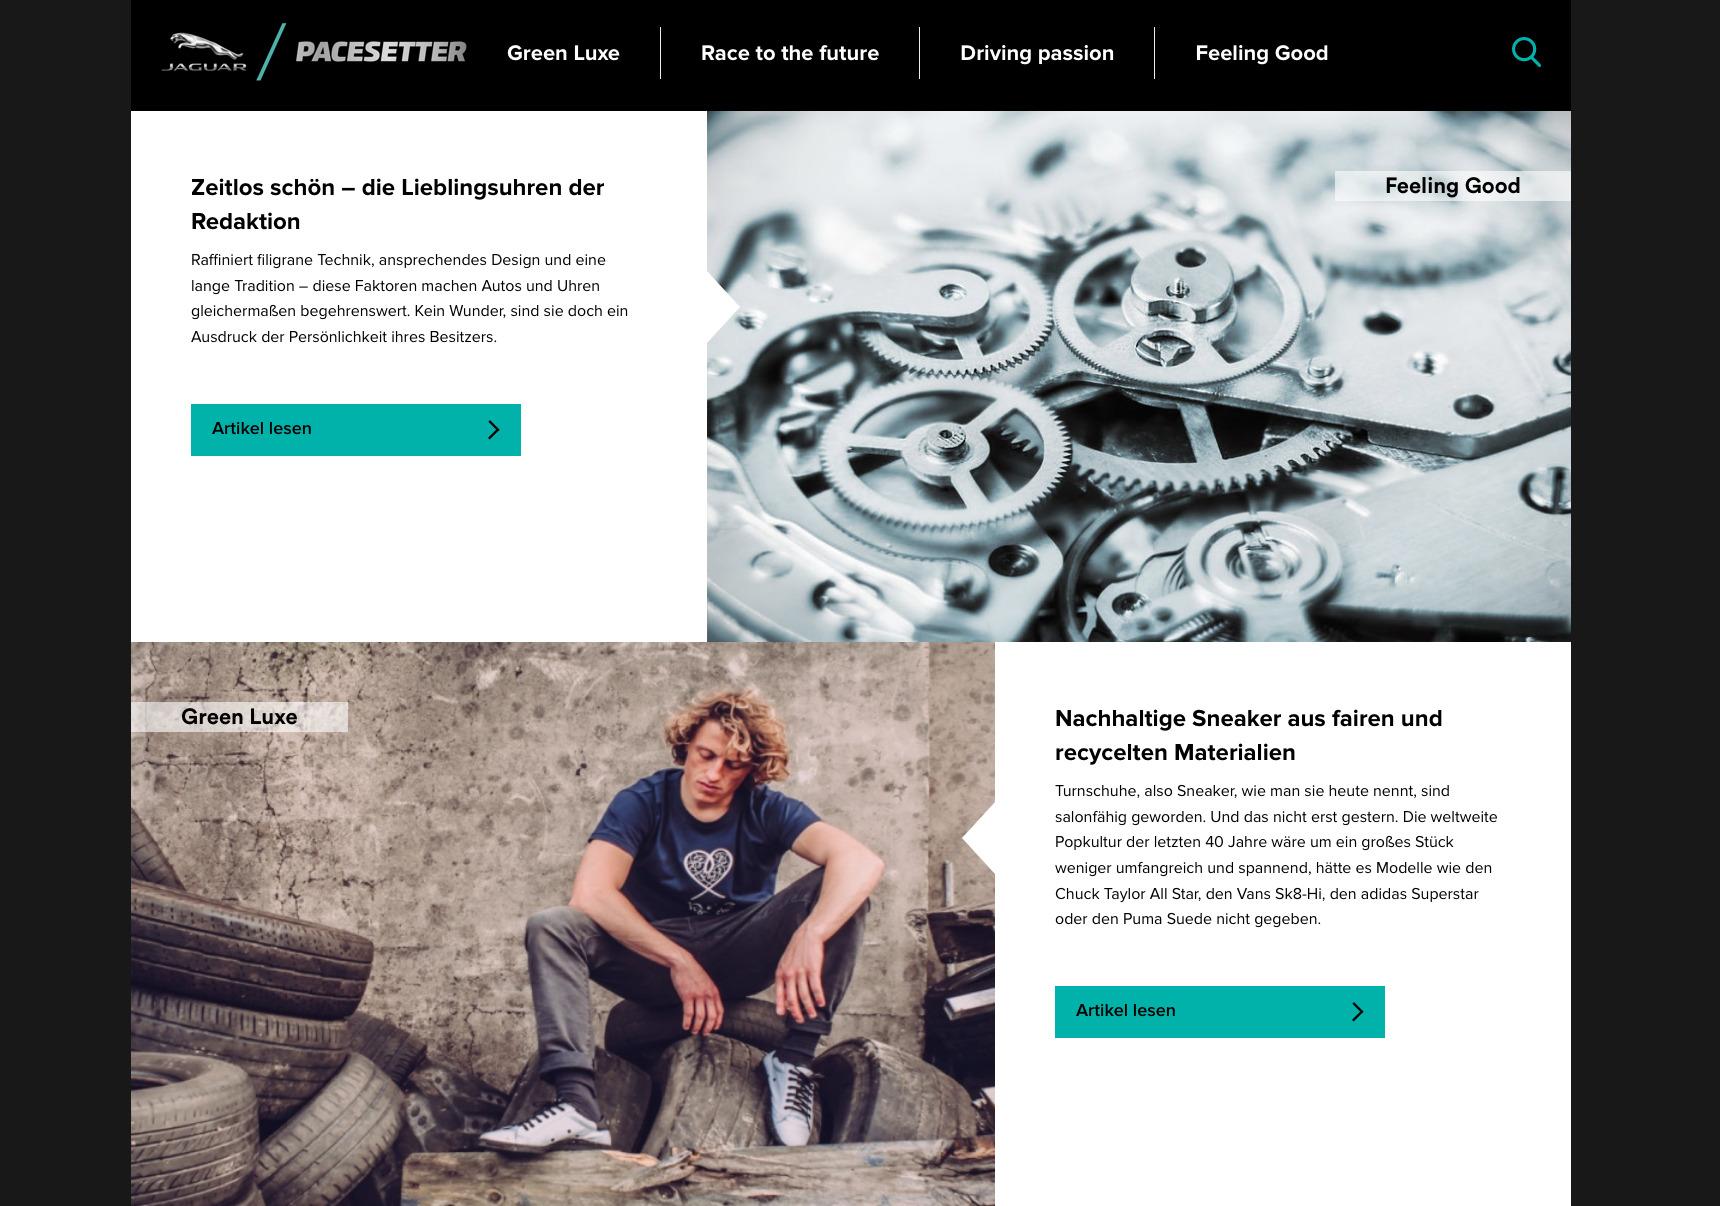 Jaguar PACESETTER hypesRus.com HYPES ARE US Sneaker